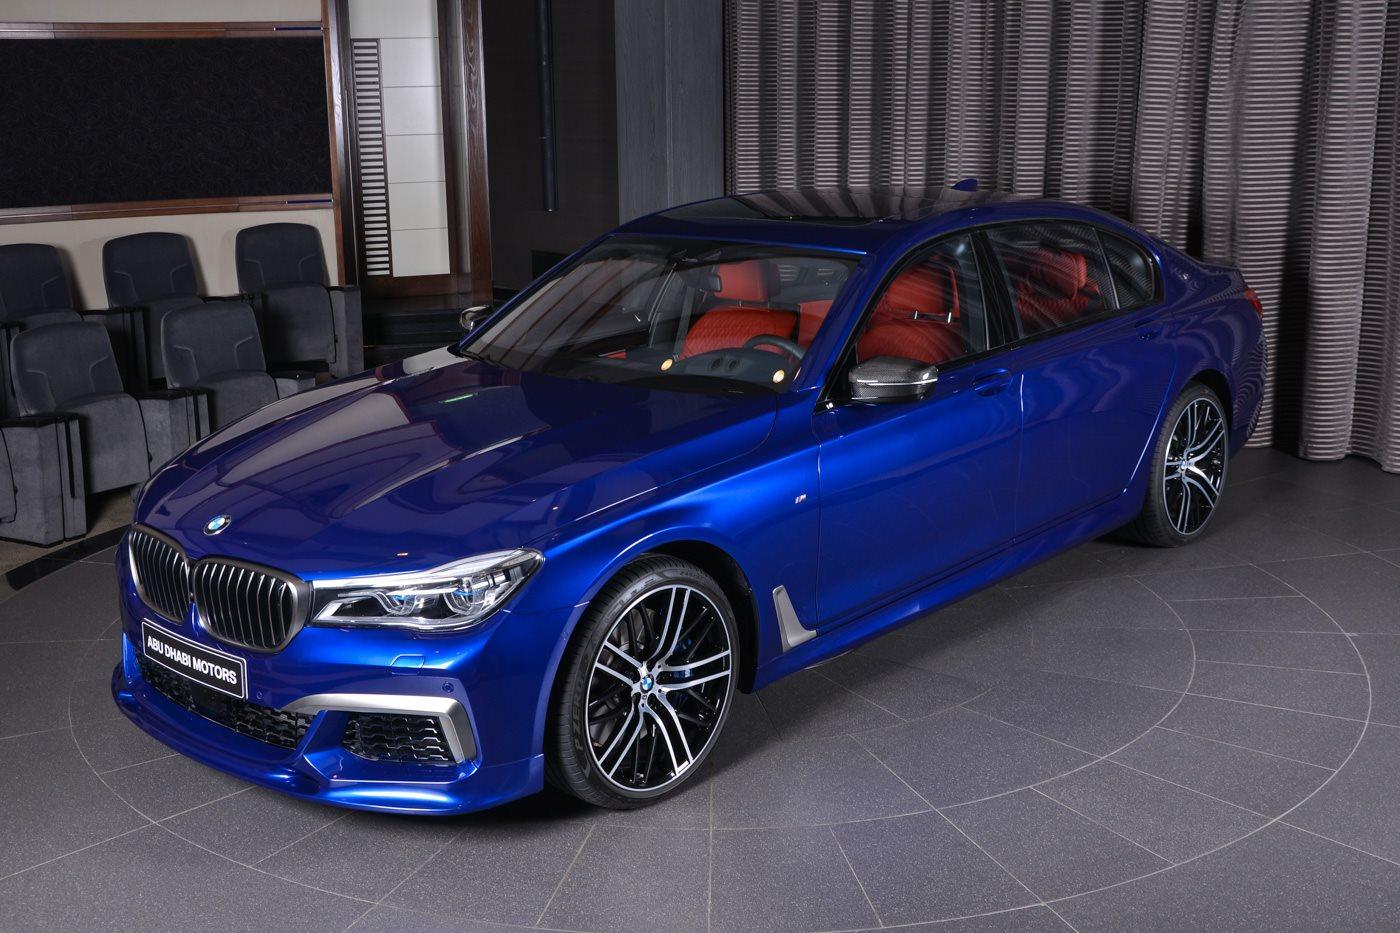 San Marino Blue BMW M760Li Looks Like a Performance Flagship - autoevolution